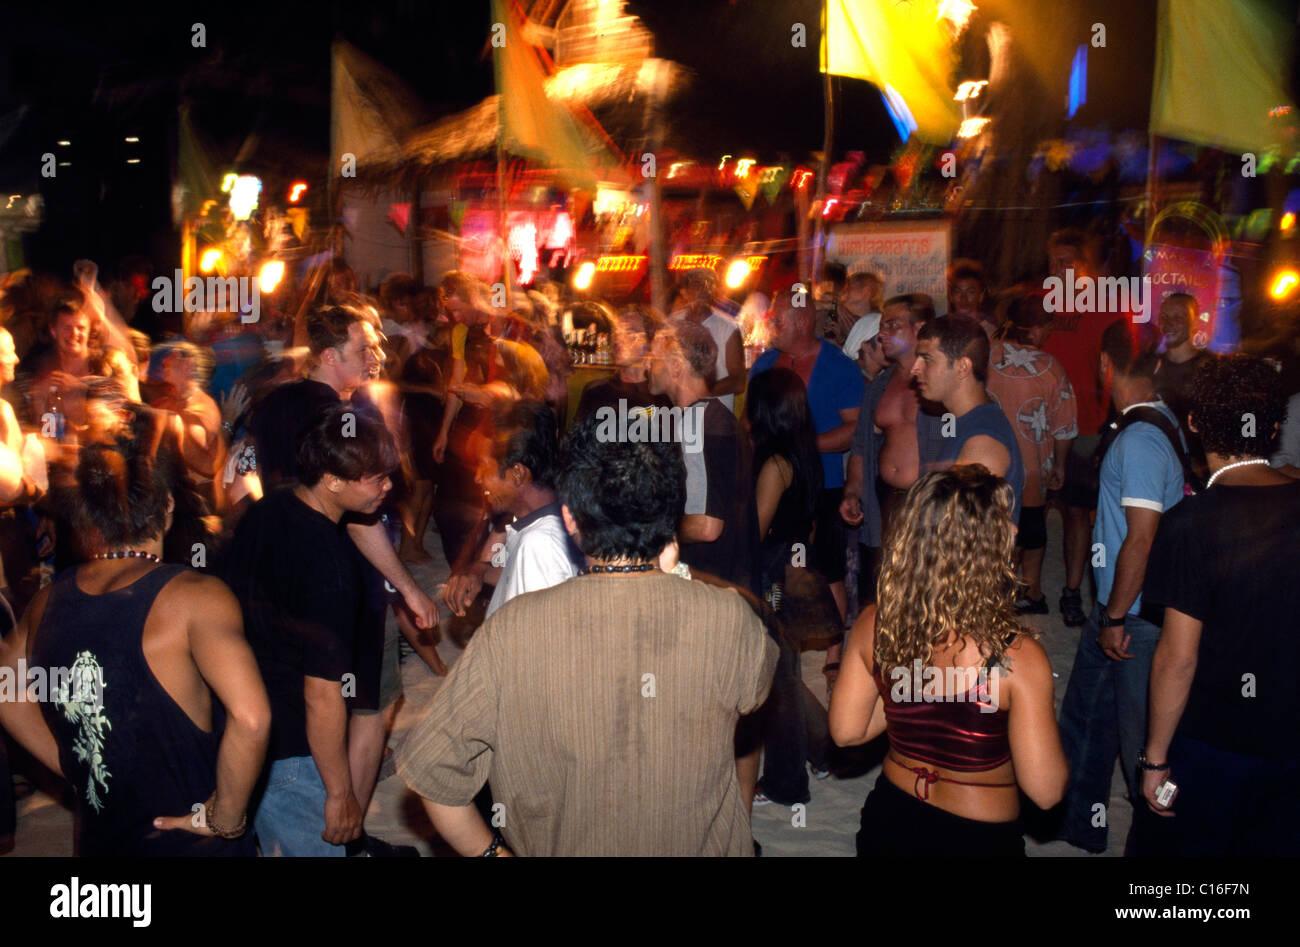 People dancing at the Full Moon Party, Ko Phangan, Thailand, Asia - Stock Image